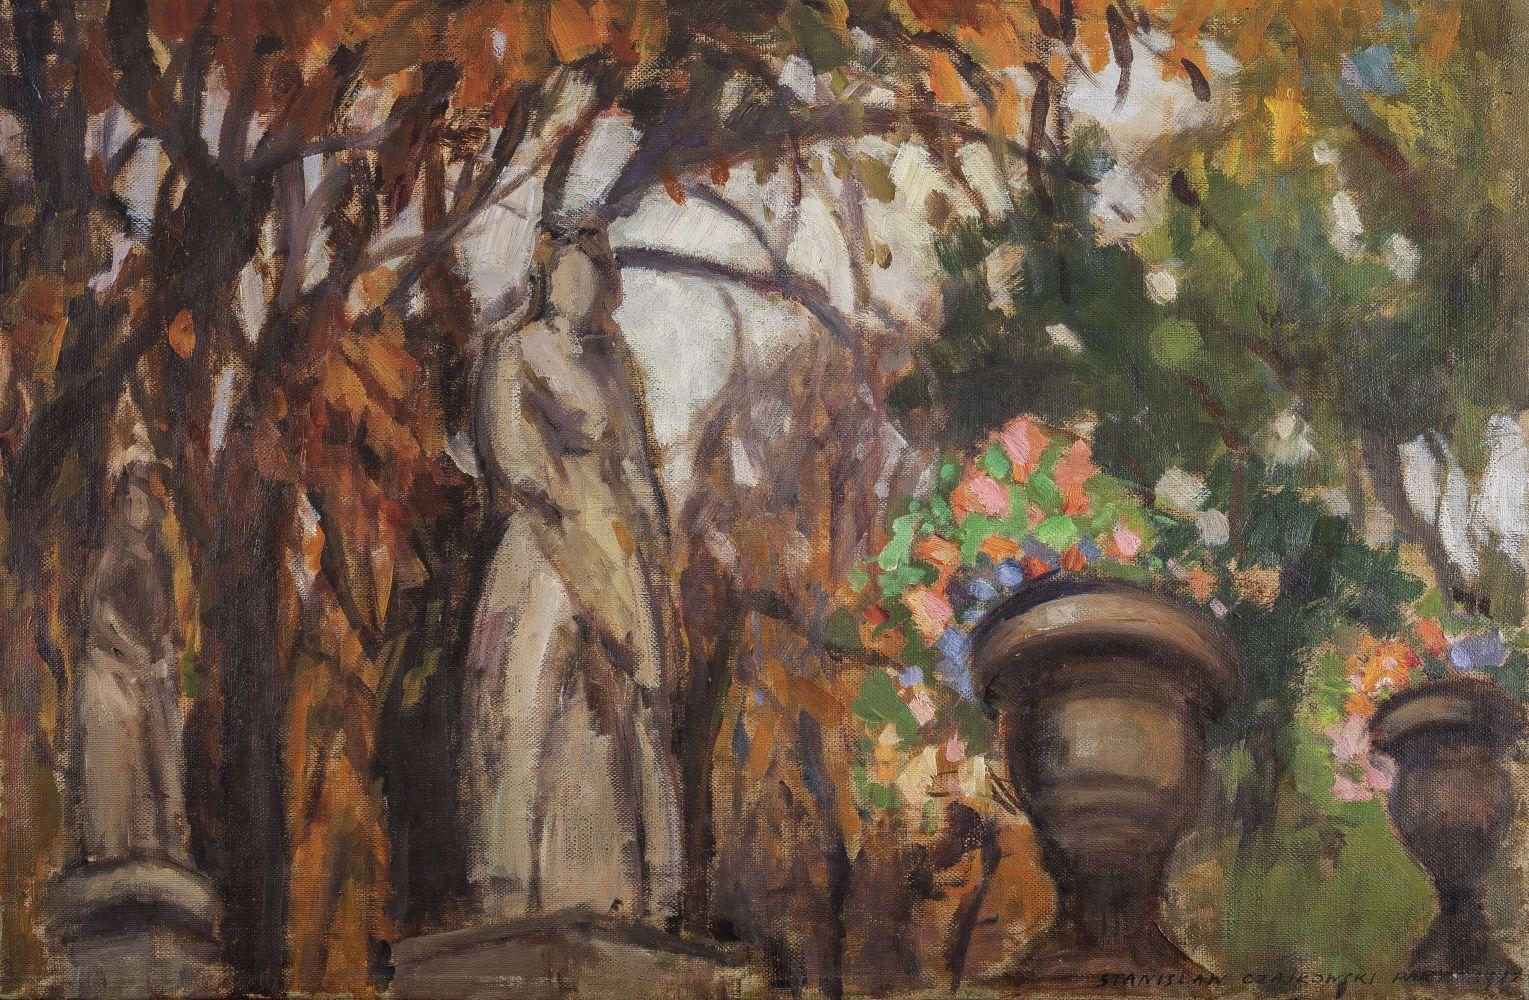 Ogród Luksemburski w Paryżu (1912)